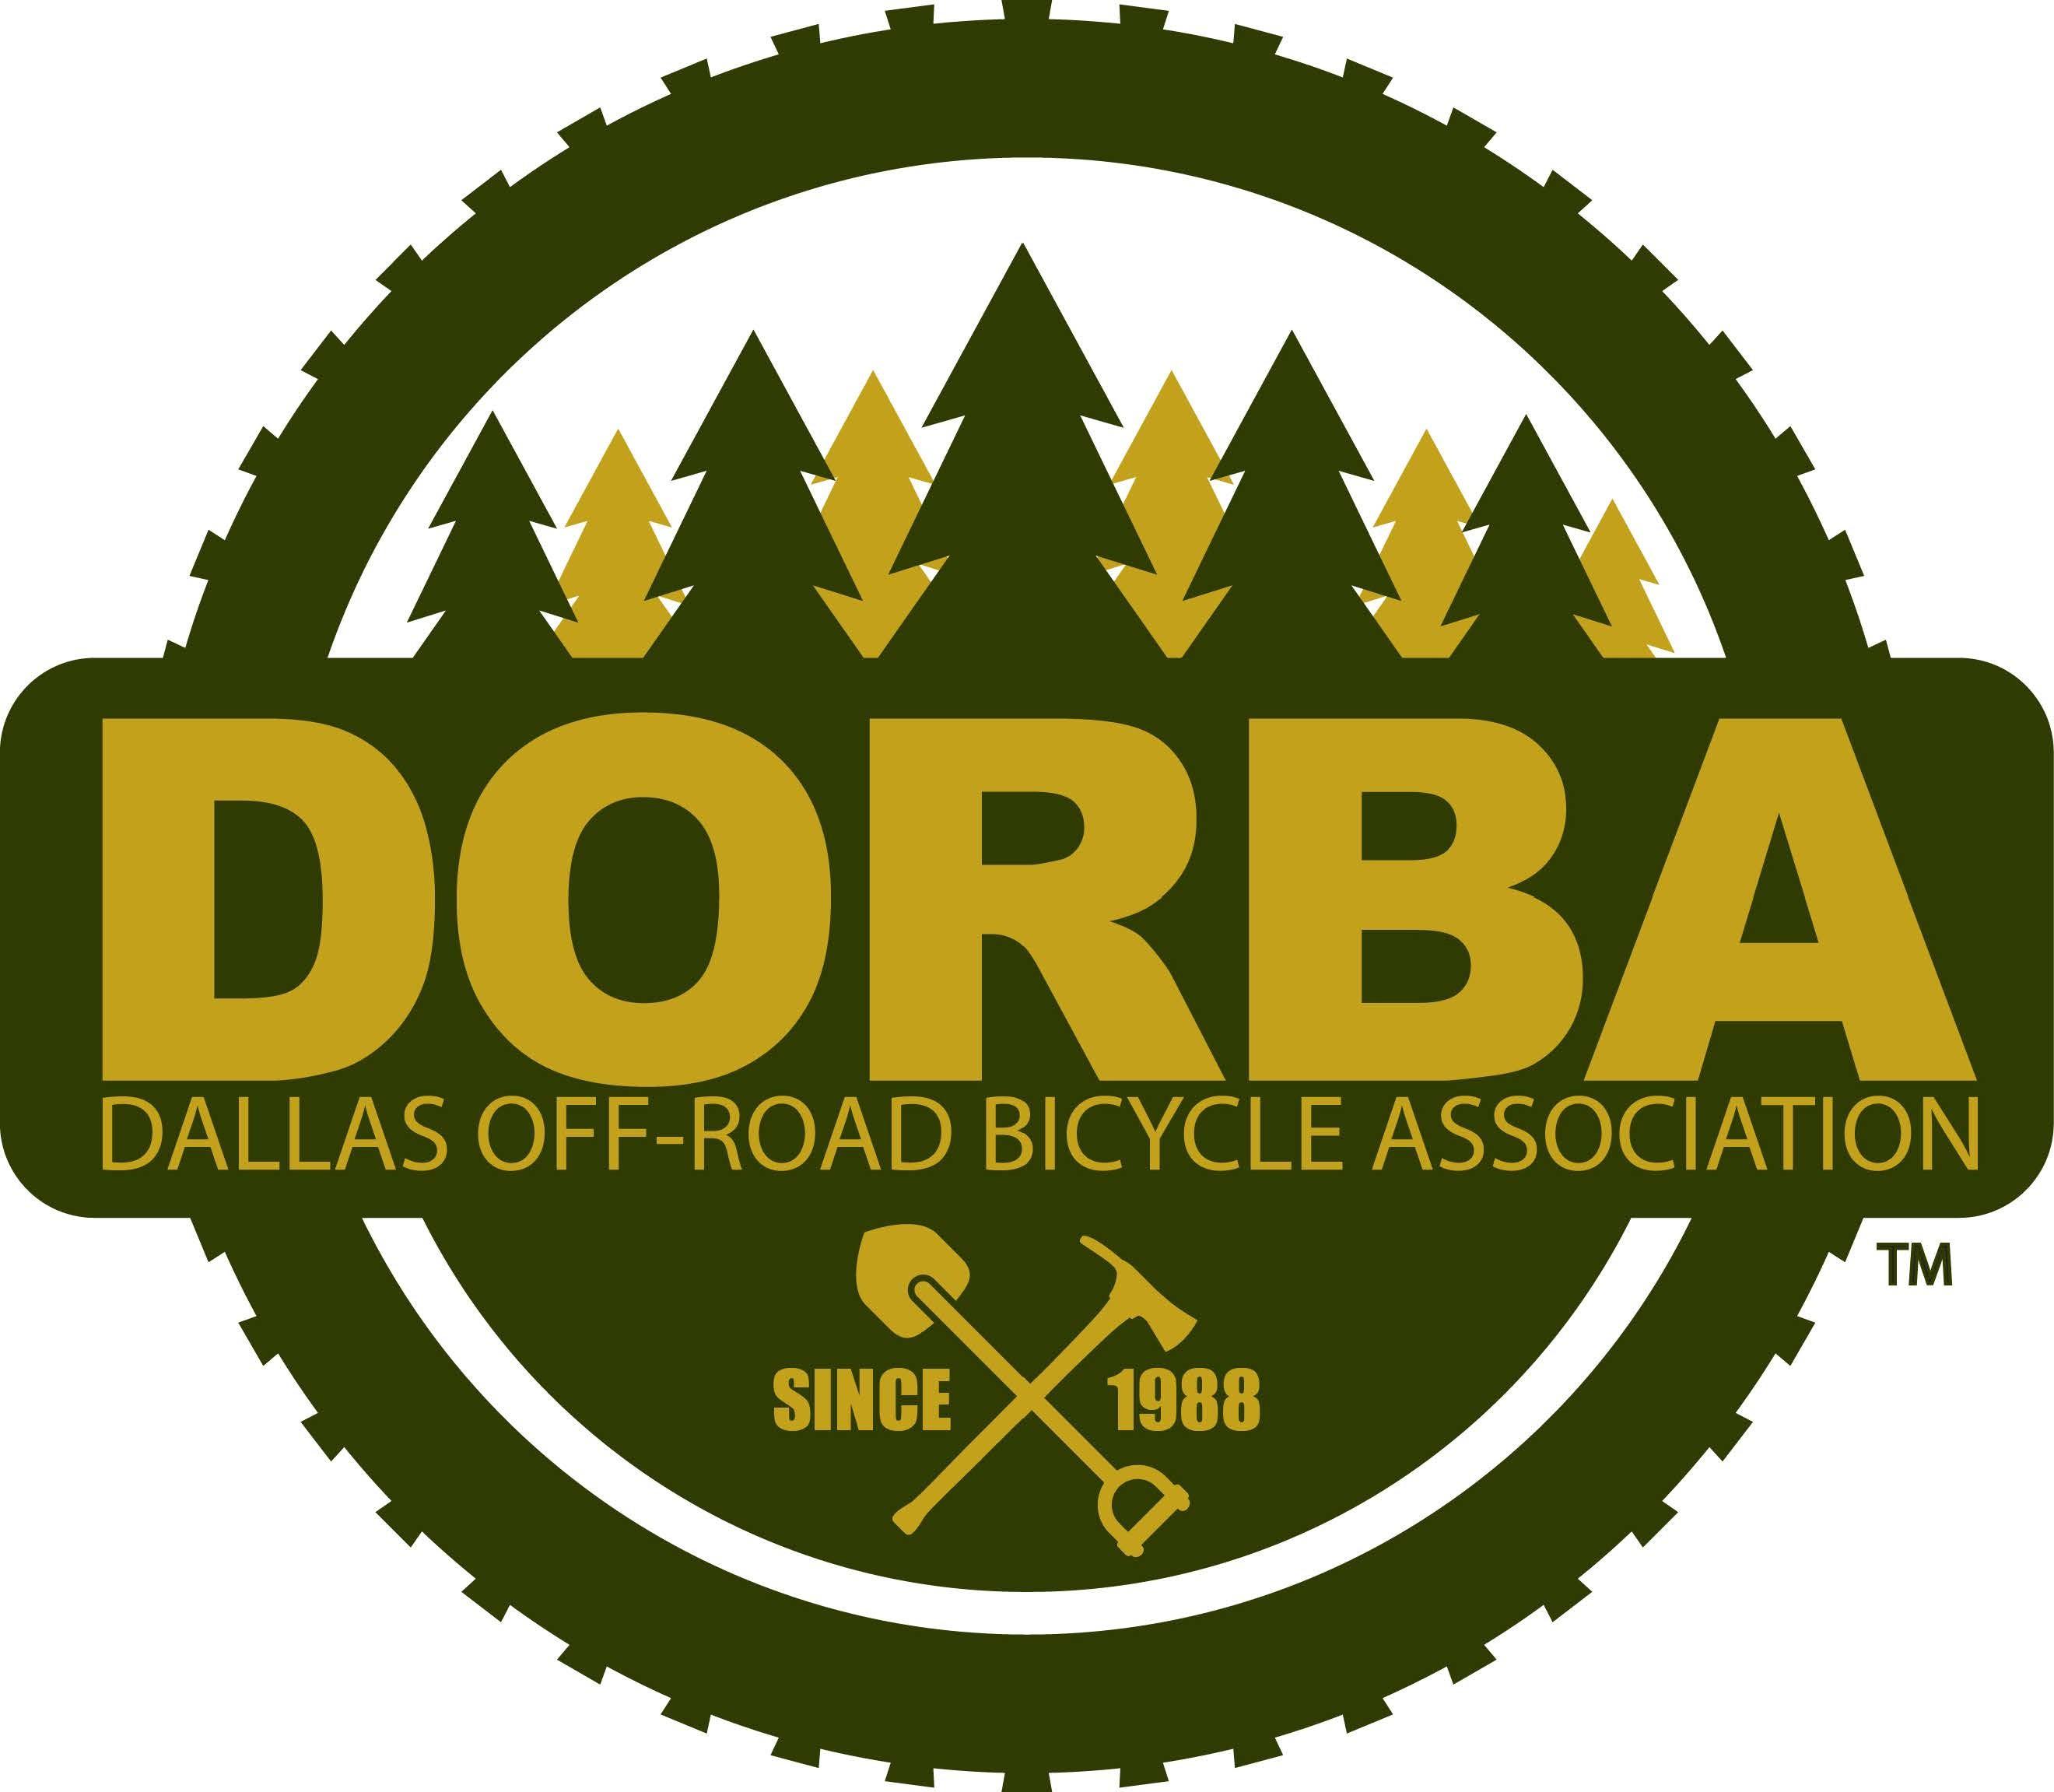 Dallas off road bicycle association logo